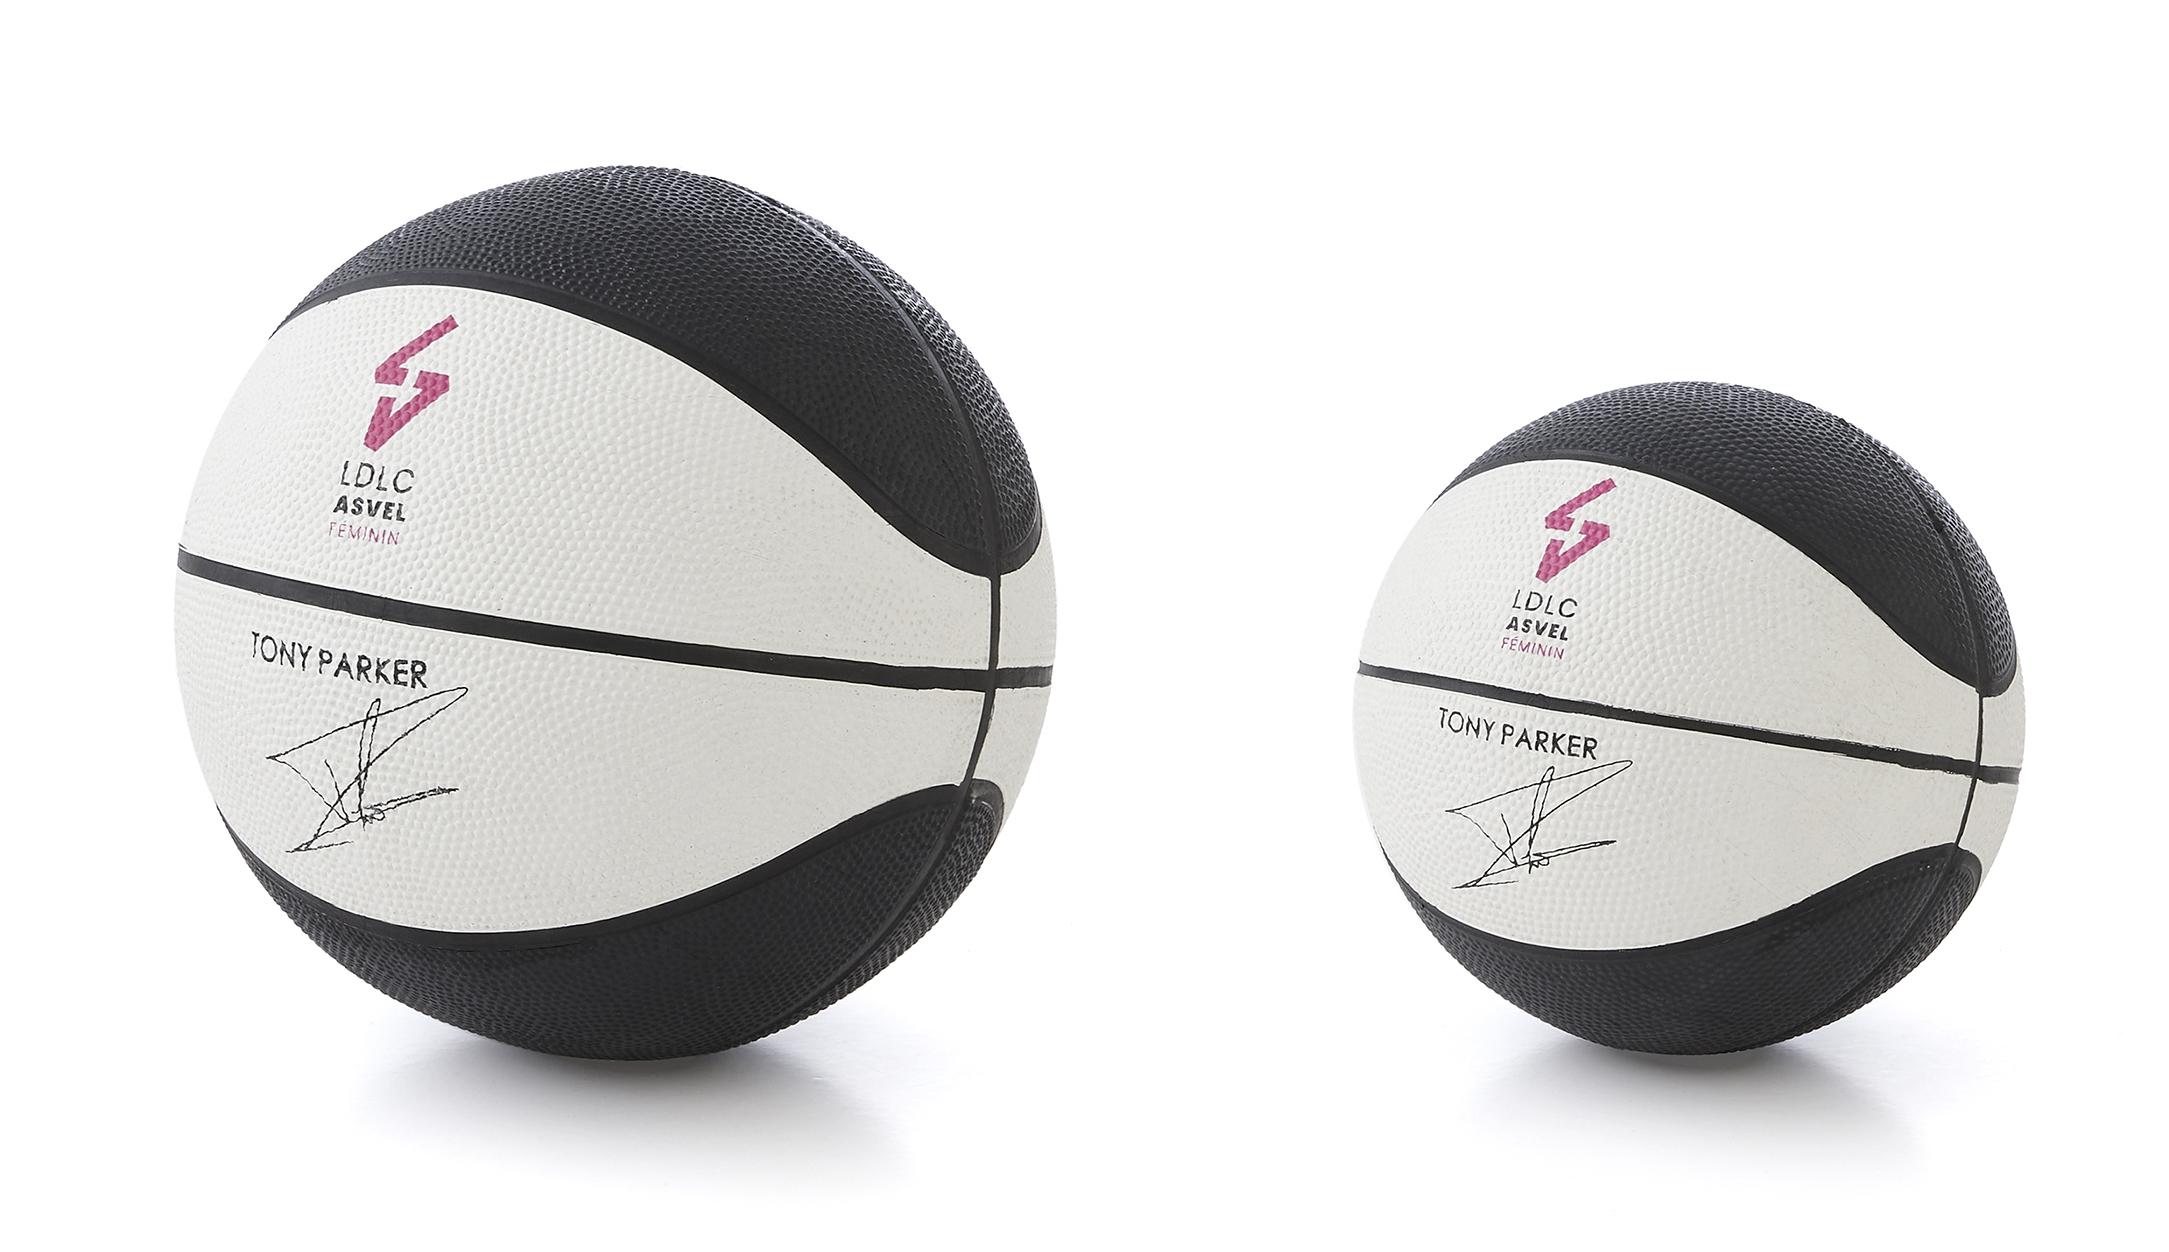 Ballon T6 - LDLC ASVEL FEM